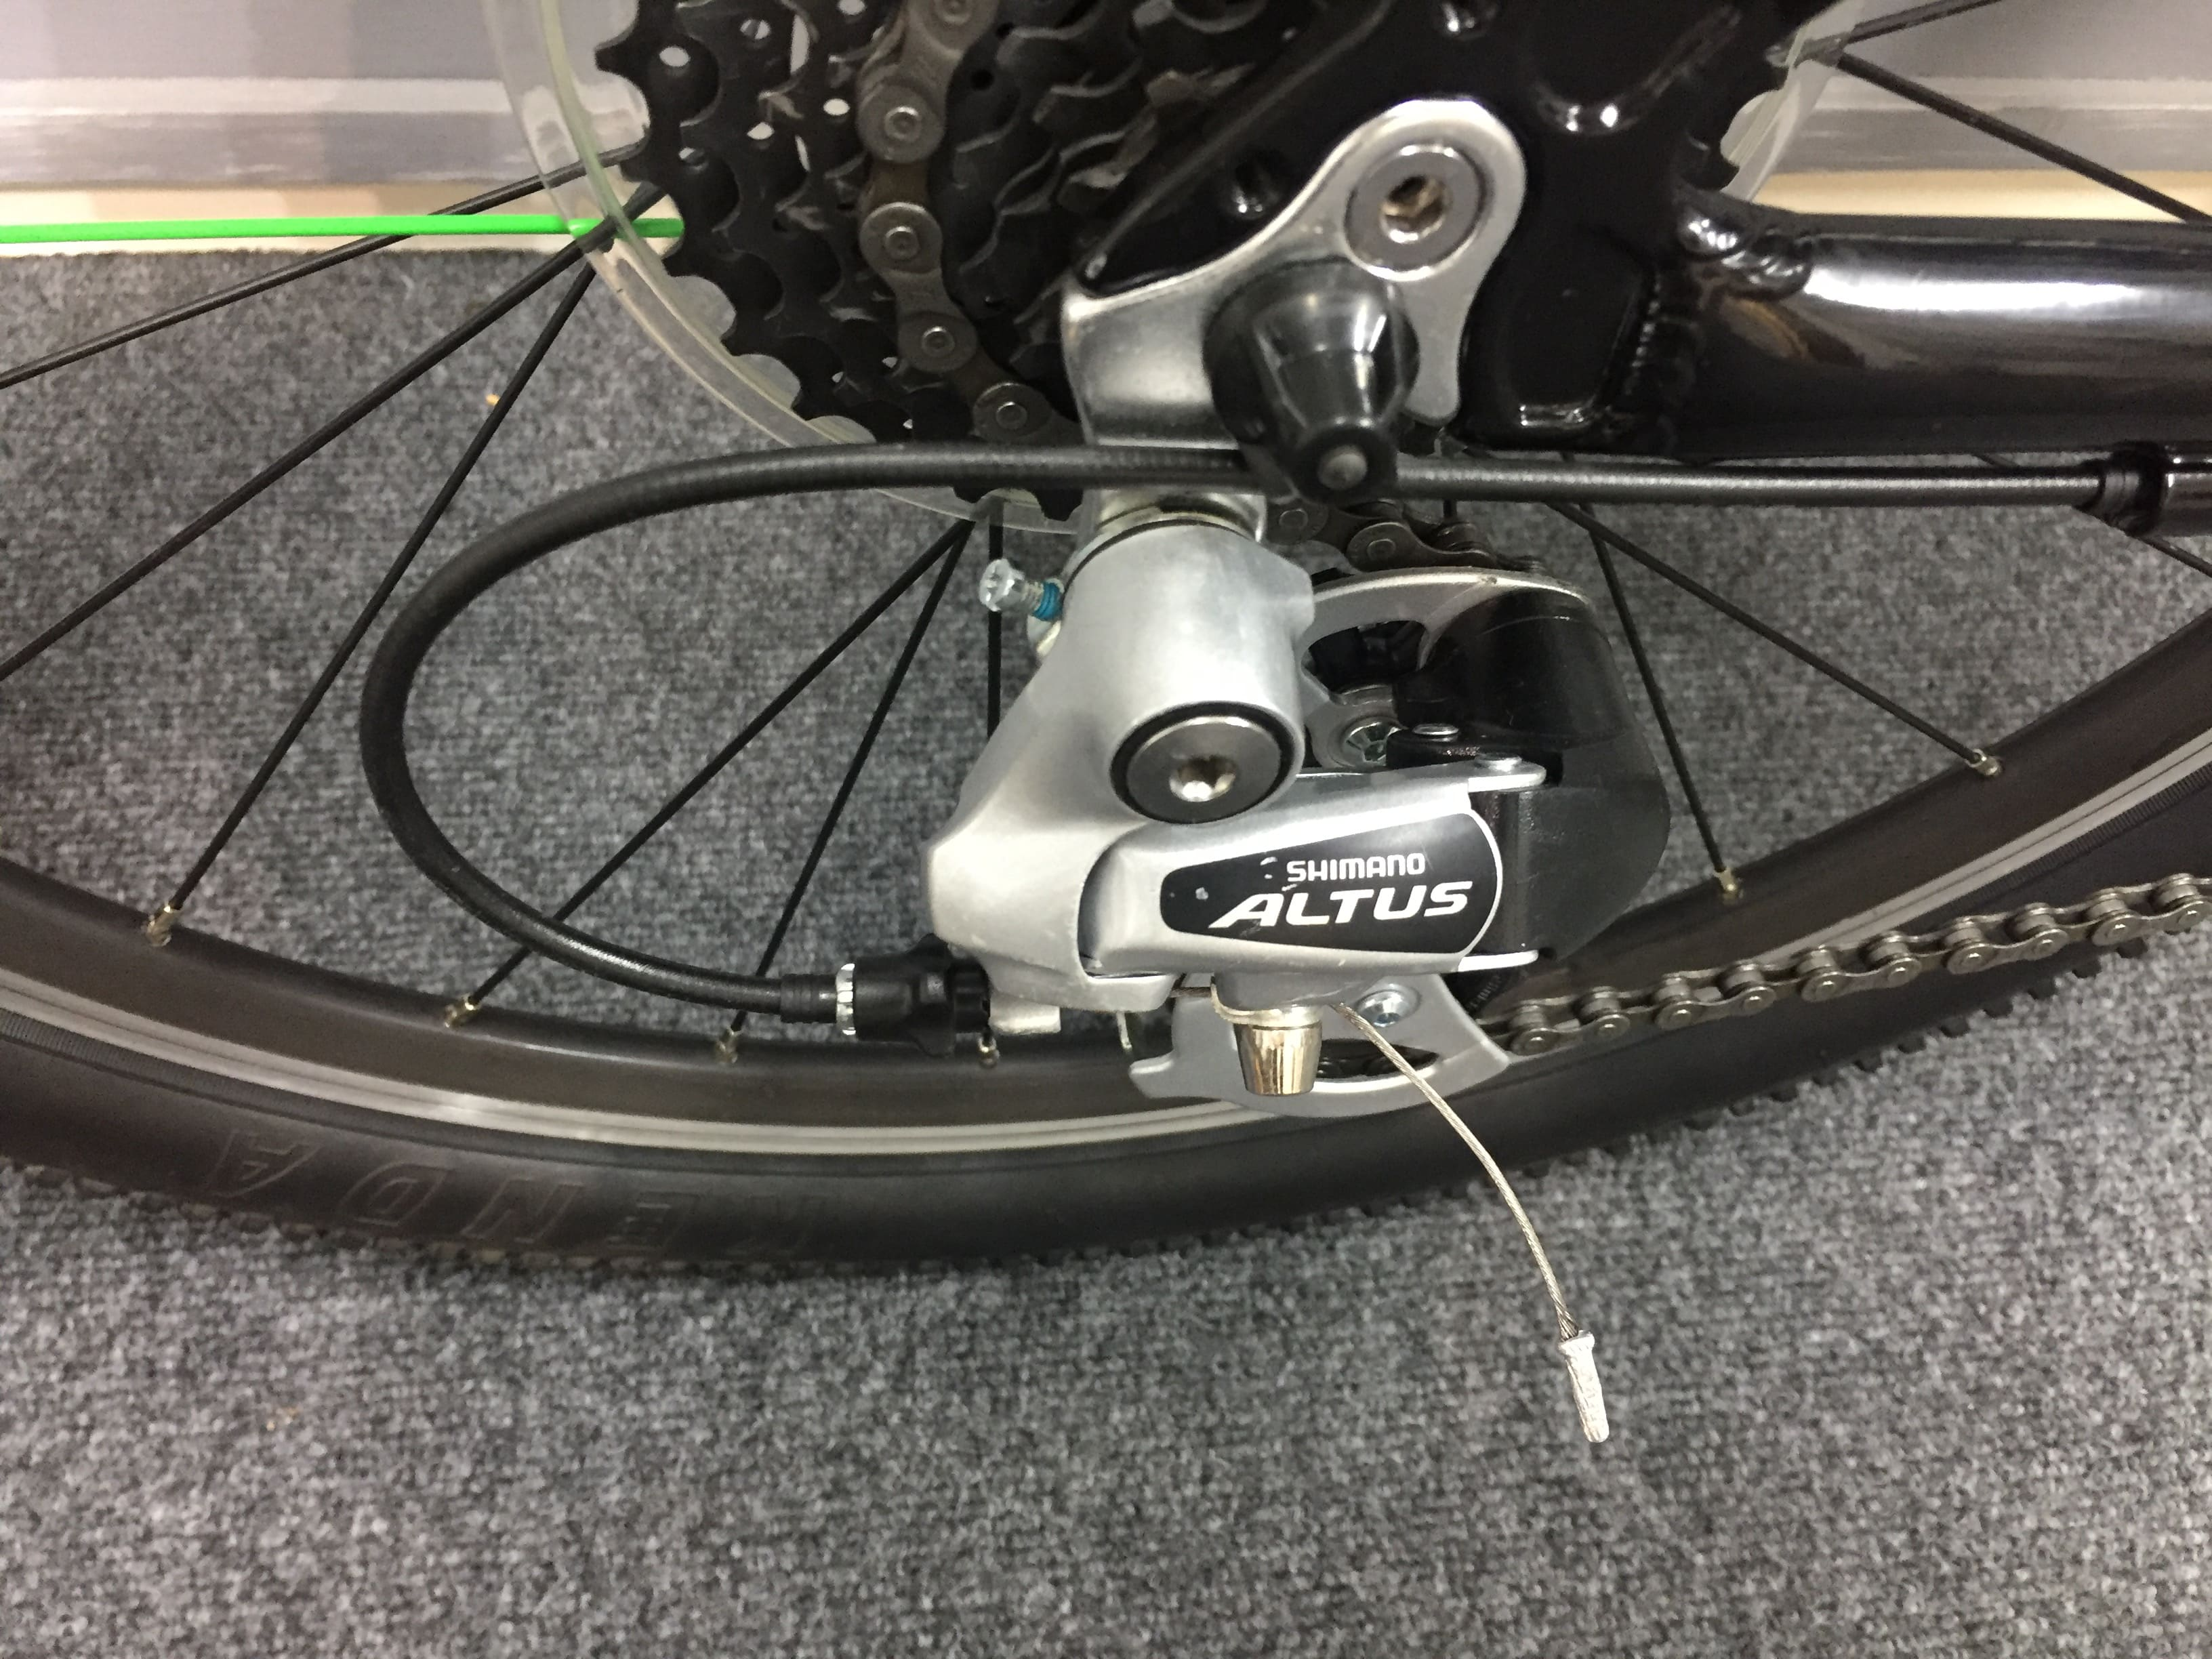 Bike Lock Ebay Uk : Ash Cycles